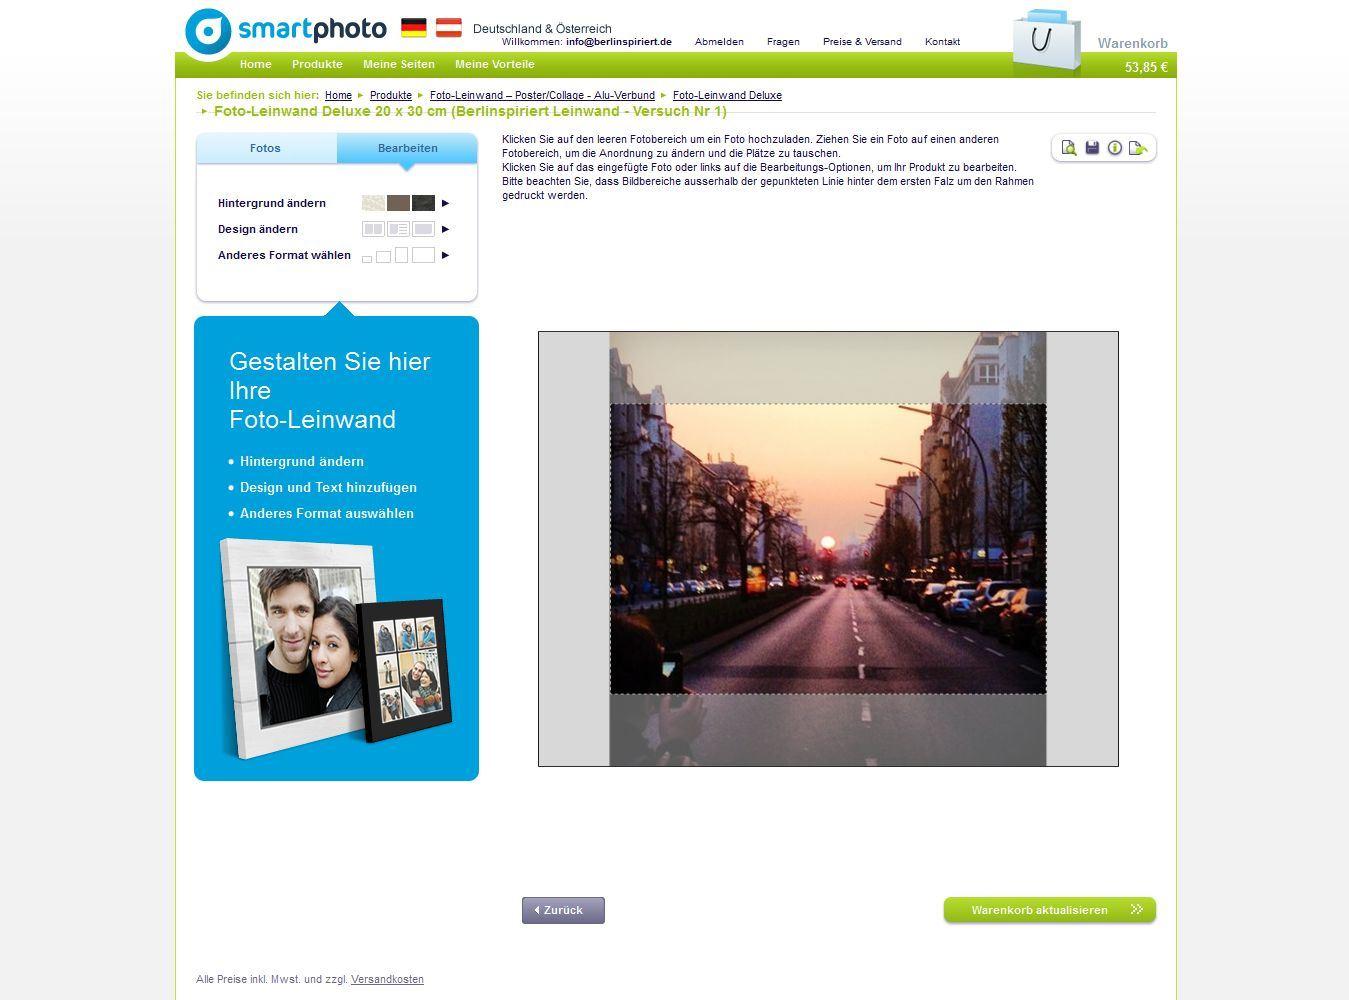 berlinspiriert-fotografie-smartphoto-design (7)